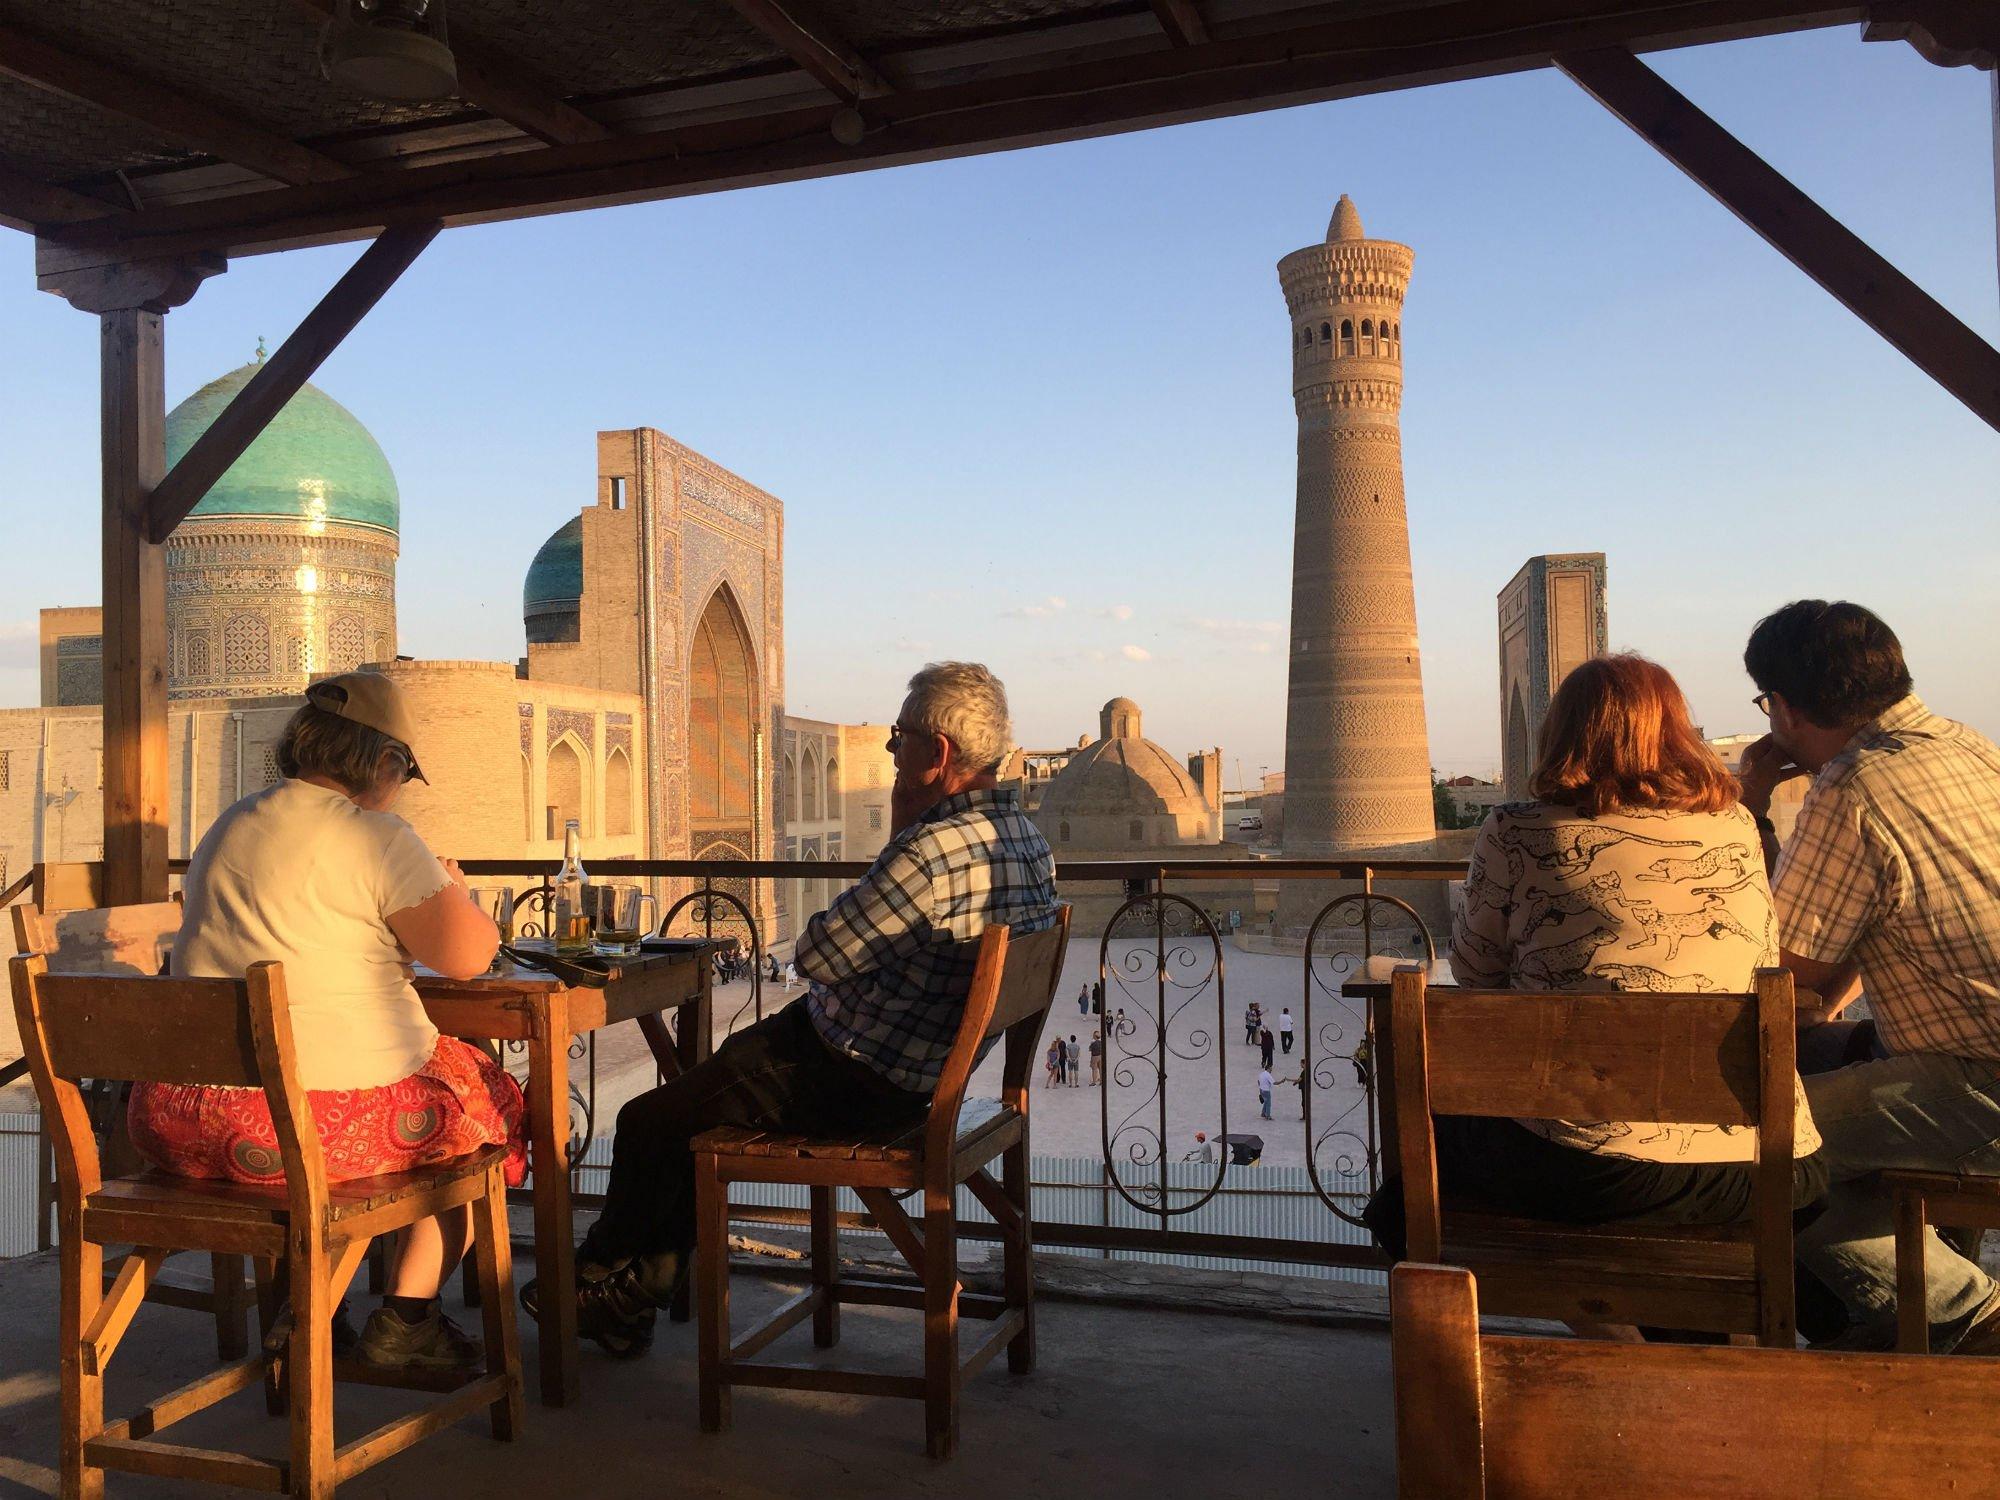 UZBEKISTAN Bukhara sunset VIAGGIO IN UZBEKISTAN